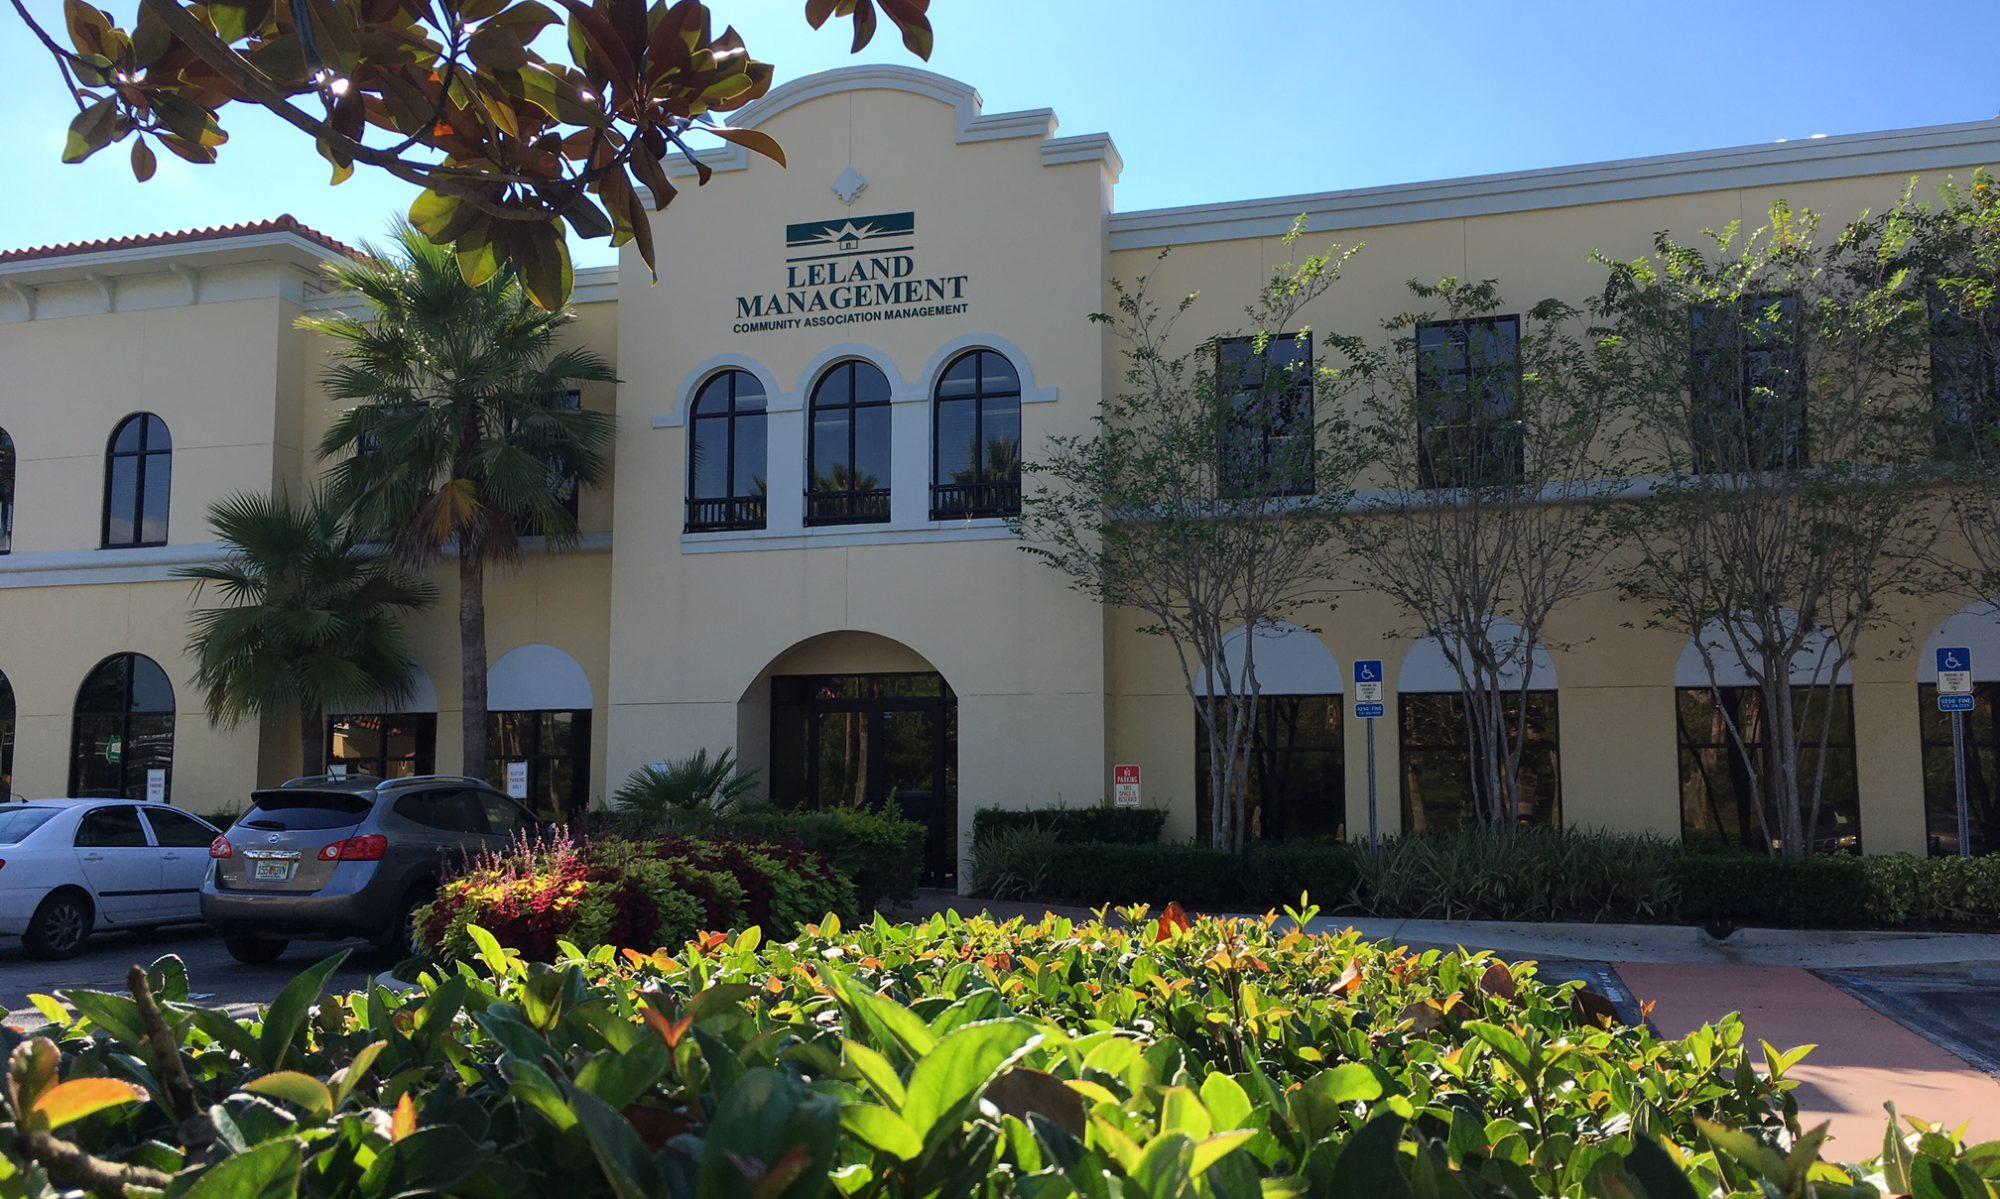 Leland Management reviews | Property Management at 6972 Lake Gloria Blvd - Orlando FL